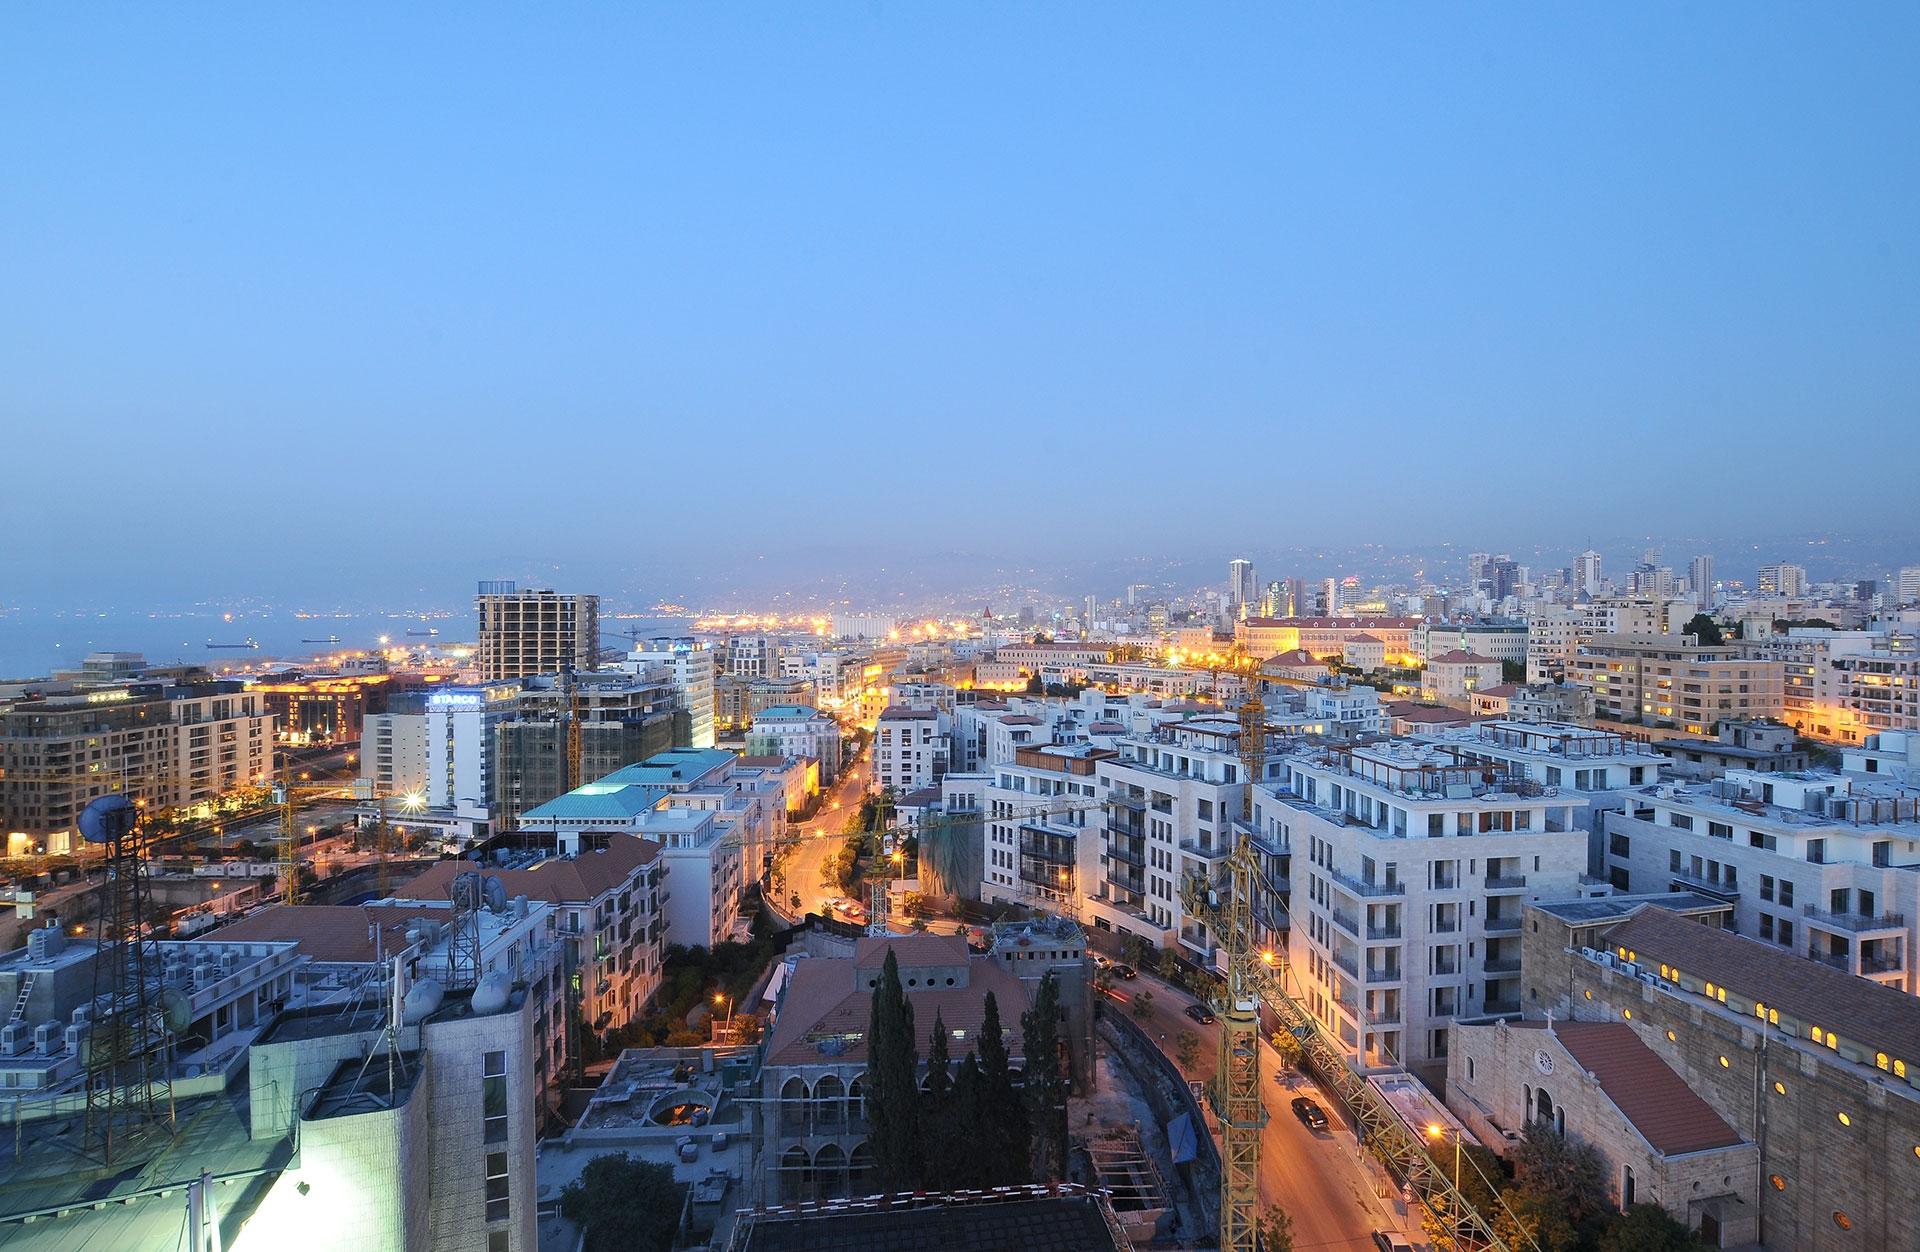 Beirut Background